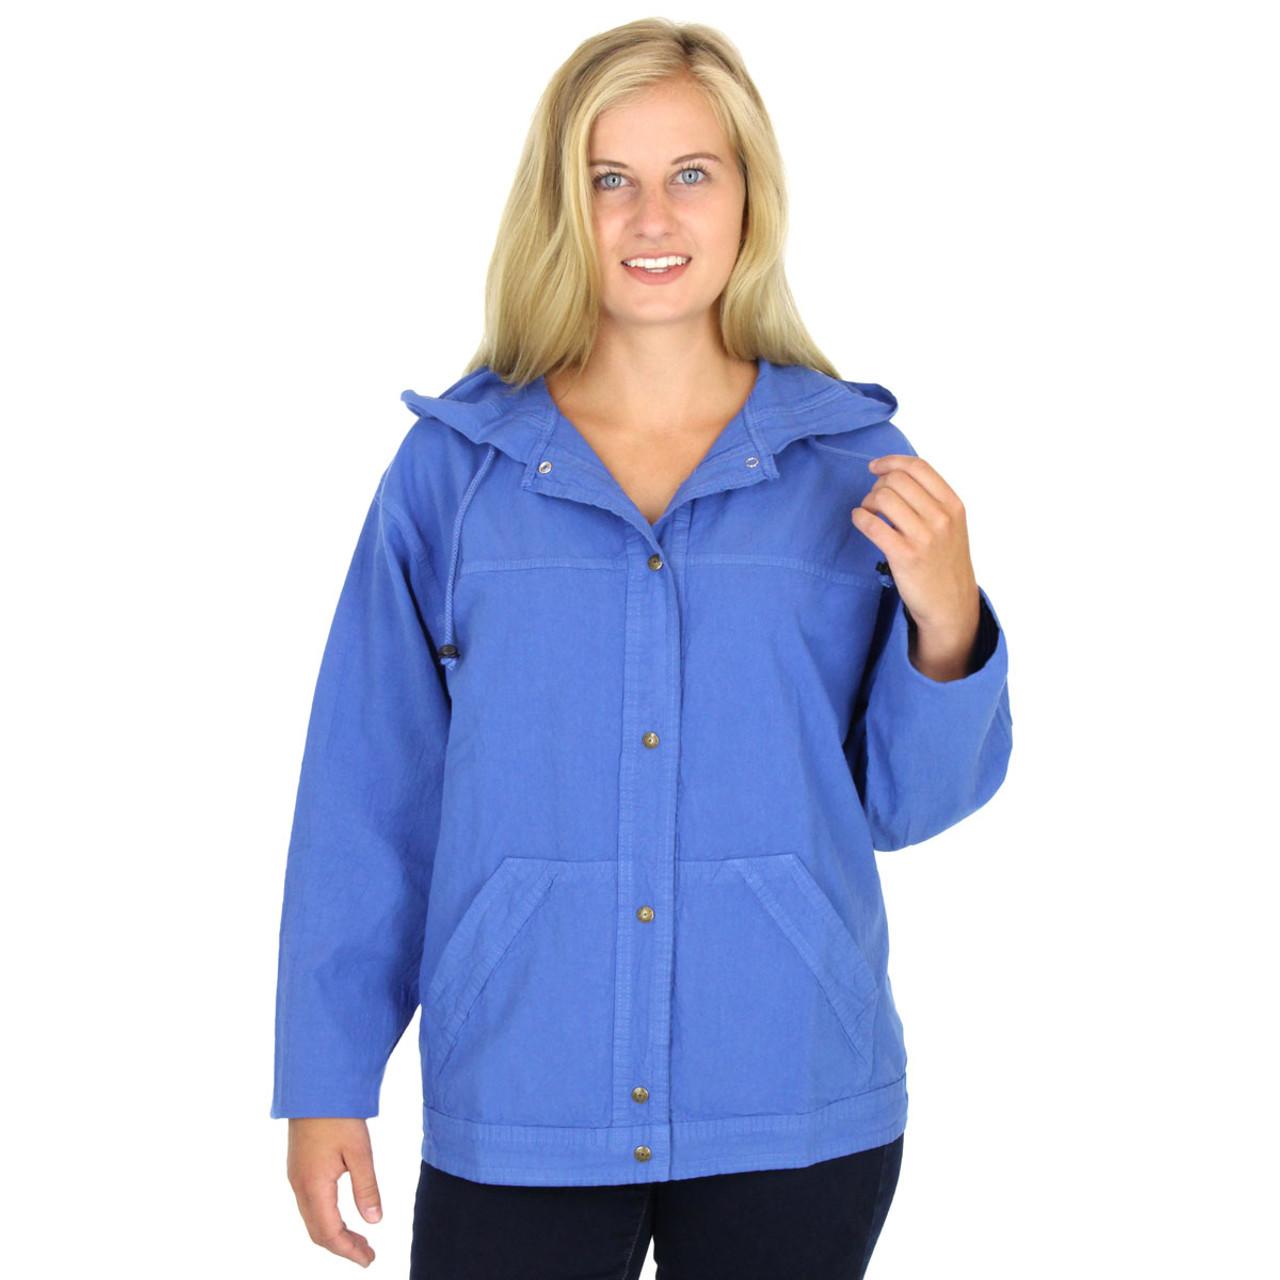 54240ea16 HoneyKomb 100% Cotton Hooded Shirt Jacket / Ezze Wear / Made in Canada